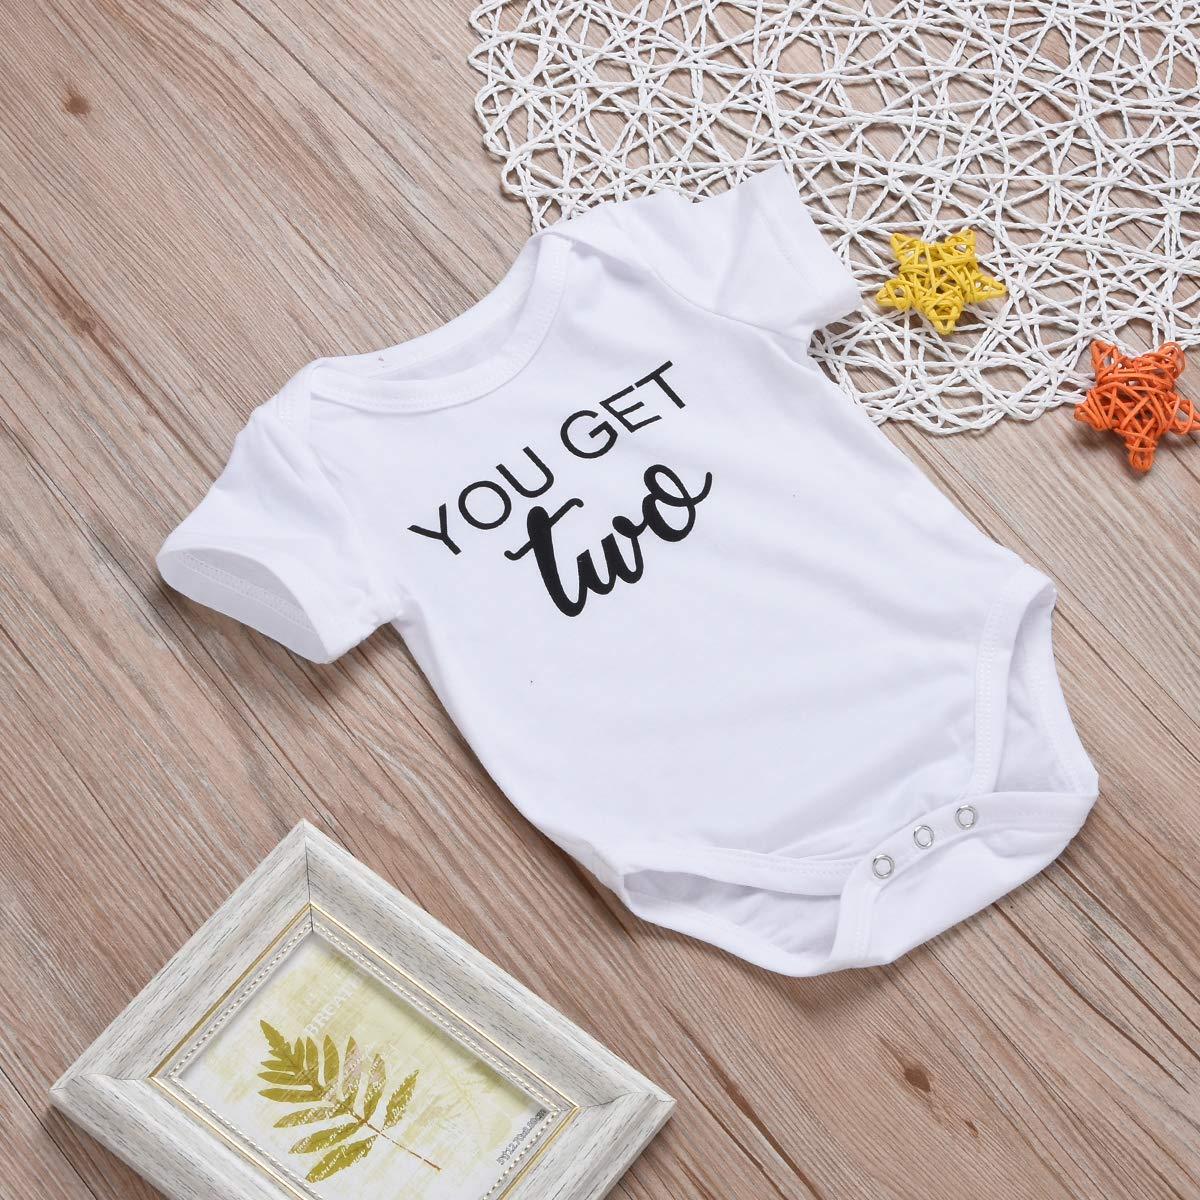 bf36fba669fcc Amazon.com  Mini honey 2Pcs Infant Twins Baby Boys Girls Short Sleeve  Letter Print Romper Bodysuit Summer Outfit Clothes  Clothing